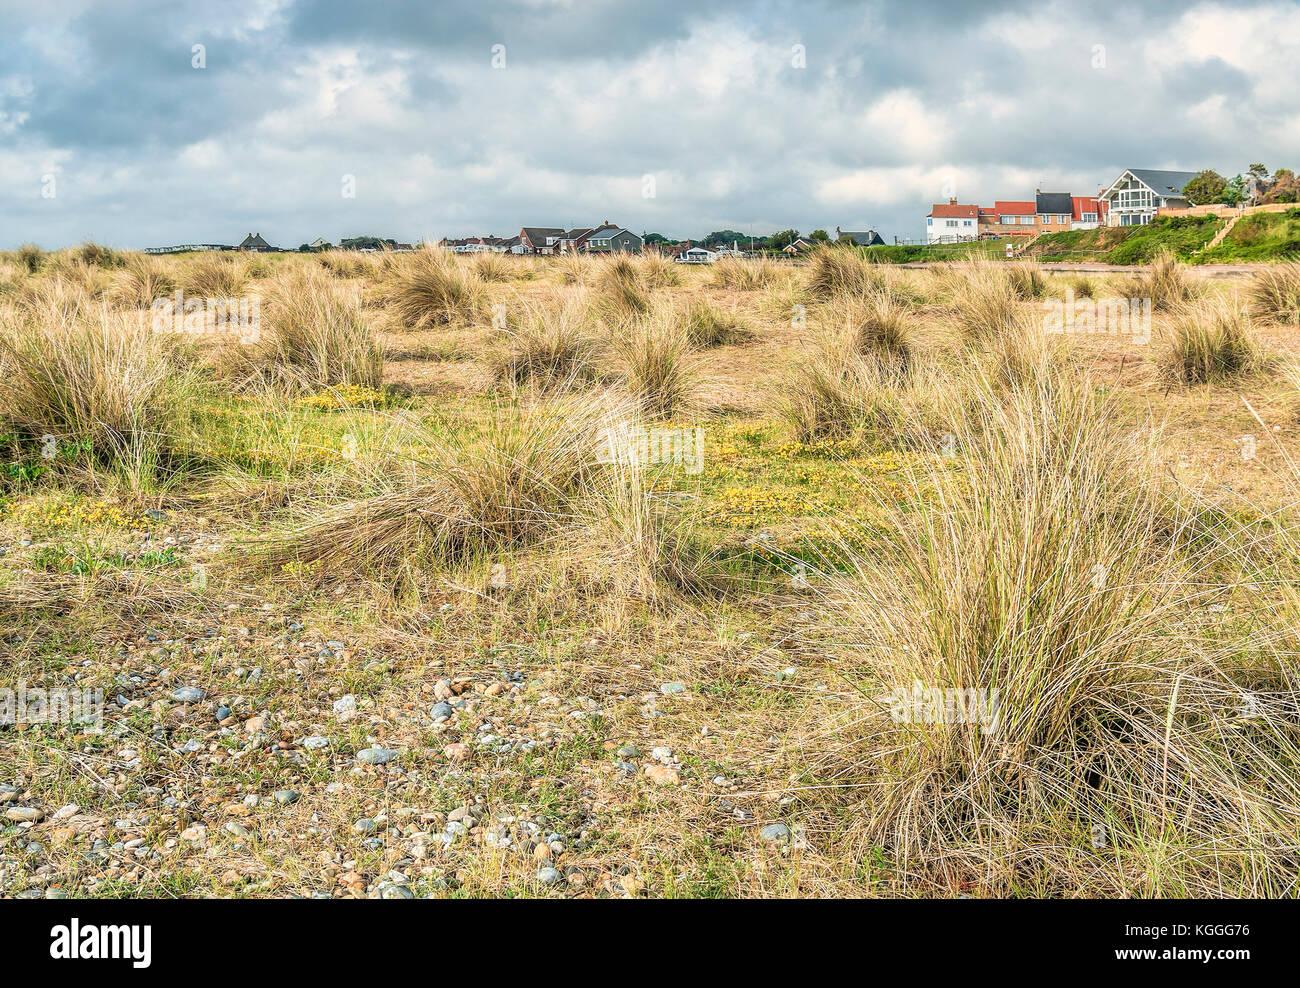 Coastal Marsh Landscape near the Village of Kessingland in East Anglia, England. Coastal Marsh Landscape near the - Stock Image